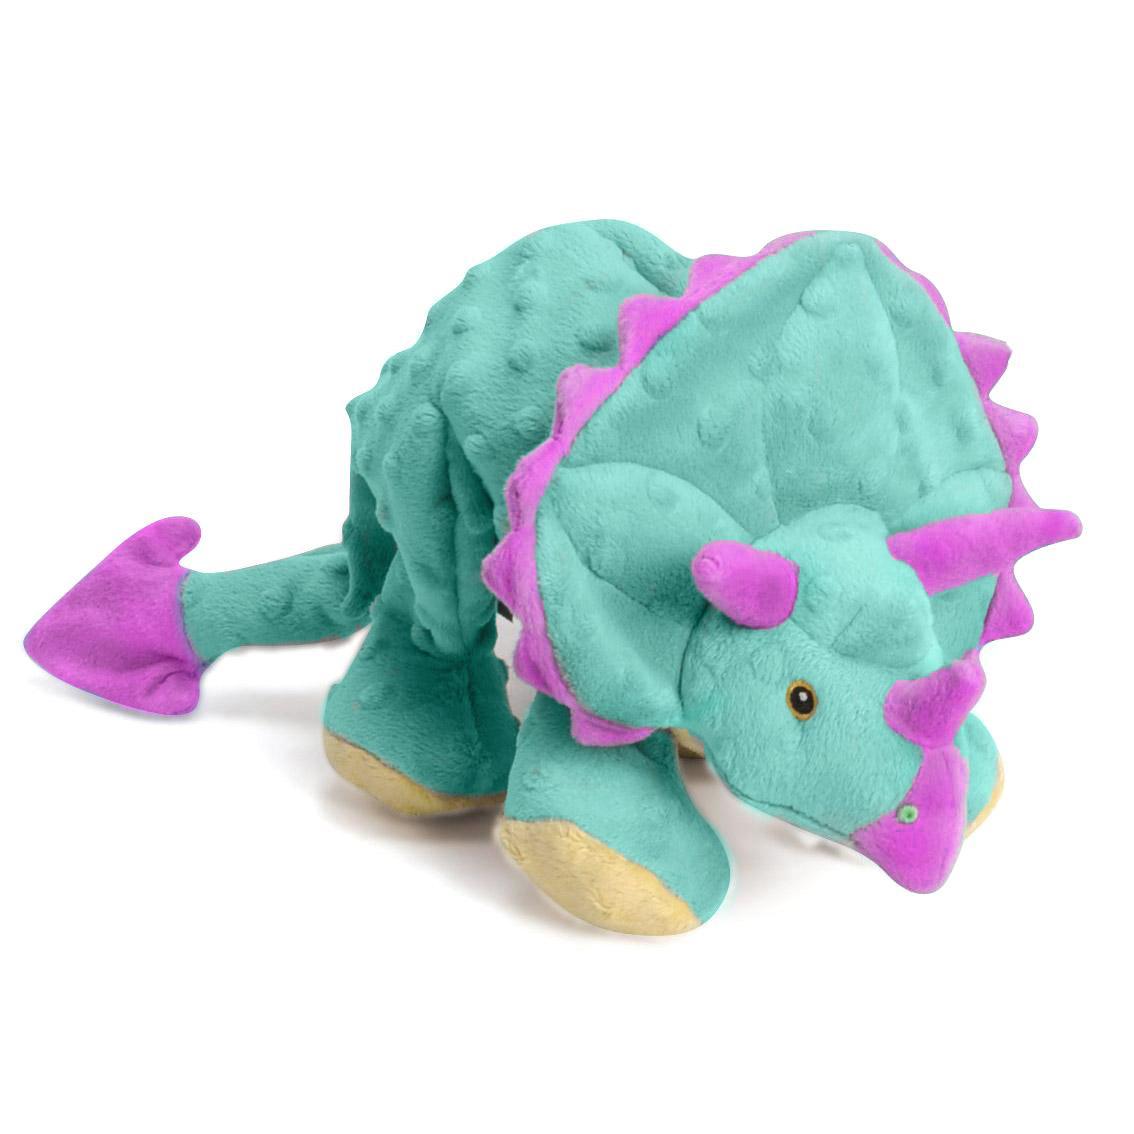 goDog Dinos Chew Guard Frills Triceratops Dog Toy - Teal